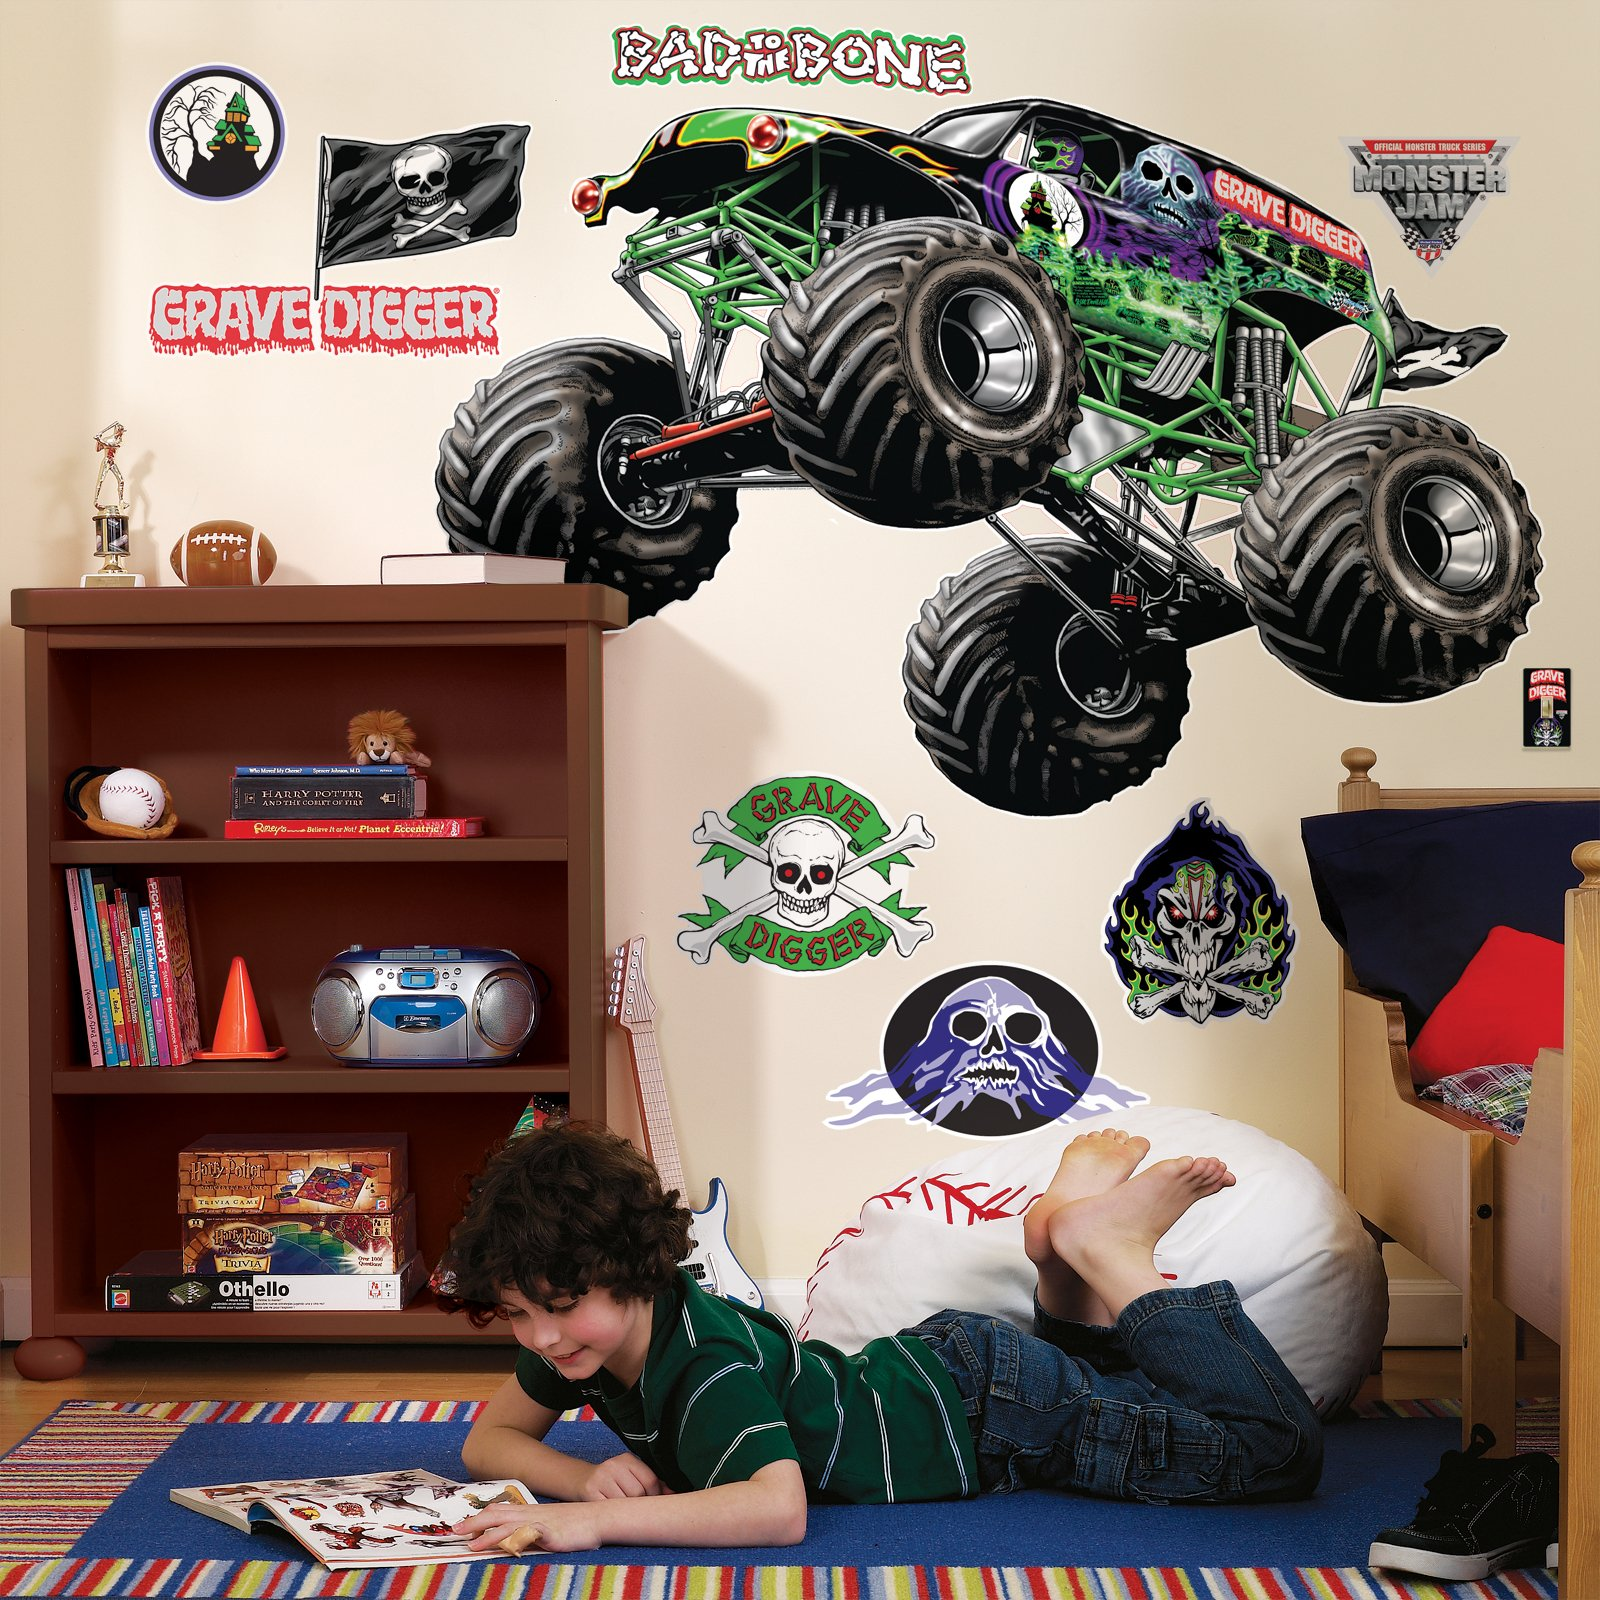 BirthdayExpress Monster Jam Room Decor - Grave Digger Giant Wall Decals by BirthdayExpress